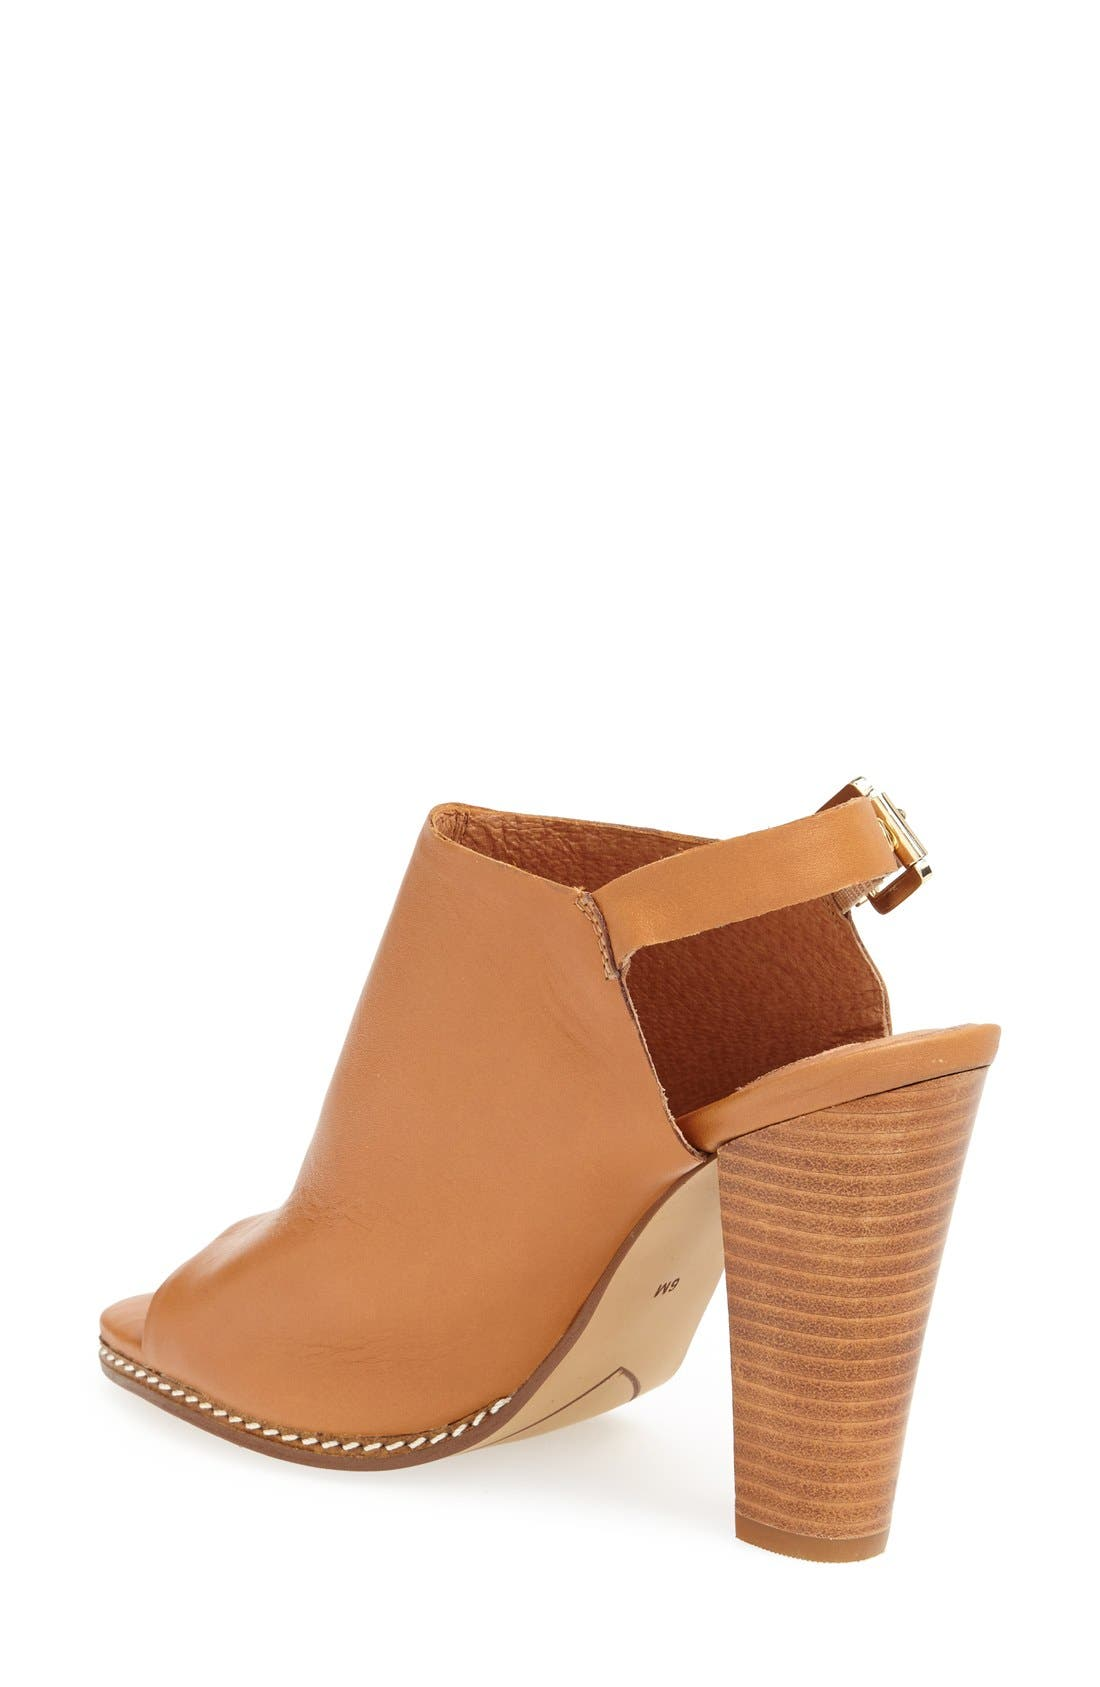 Alternate Image 2  - Halogen 'Sasha' Leather Sandal (Women)